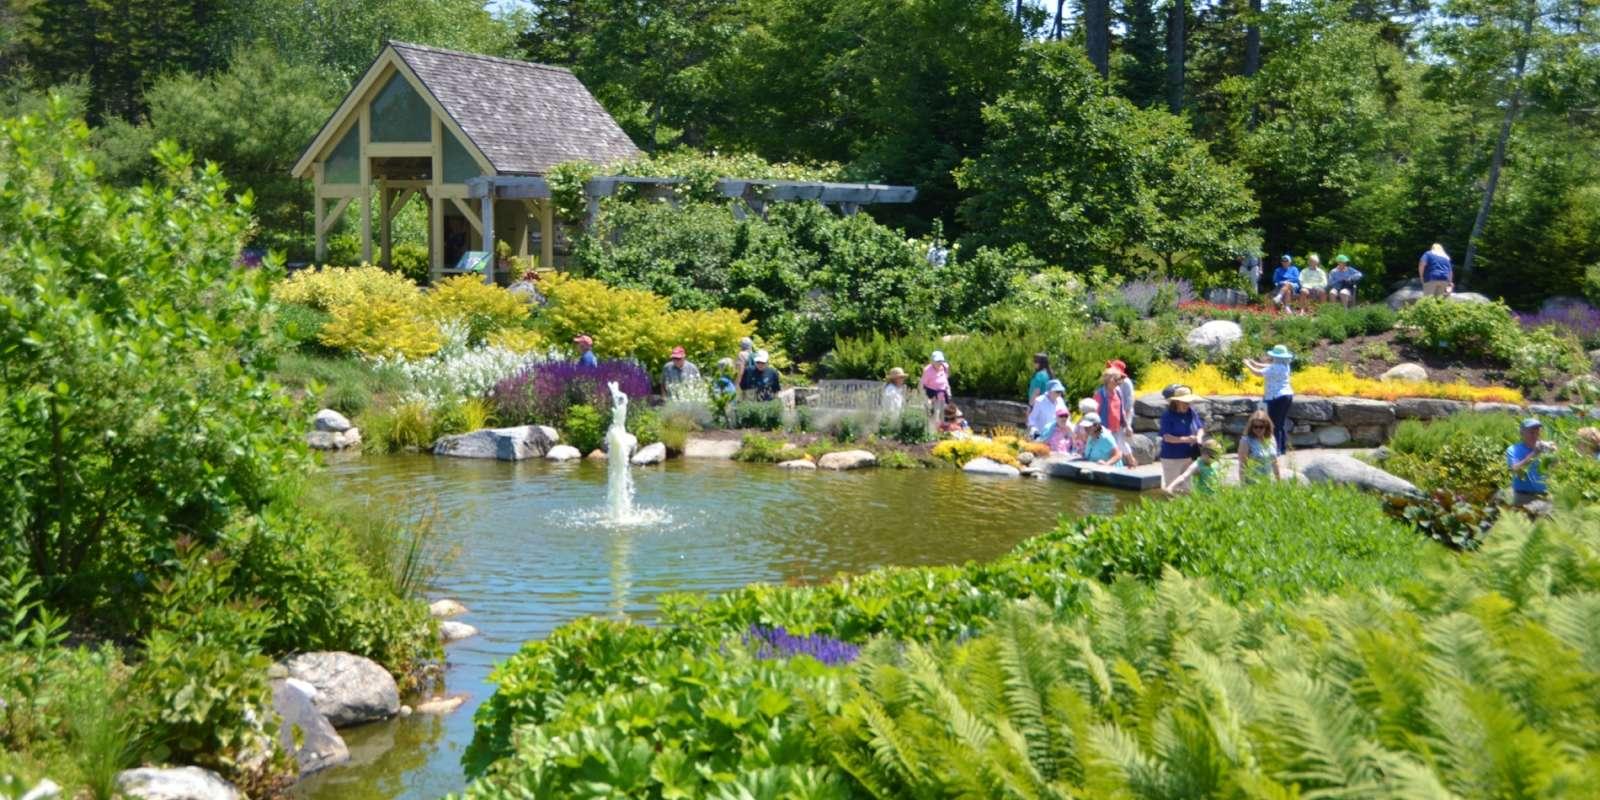 97e0a4d7 8e30 4b9f afc8 badf85d94727 50850682 e57a 47f1 911e f2719e154f34 - Coastal Maine Botanical Gardens Promo Code